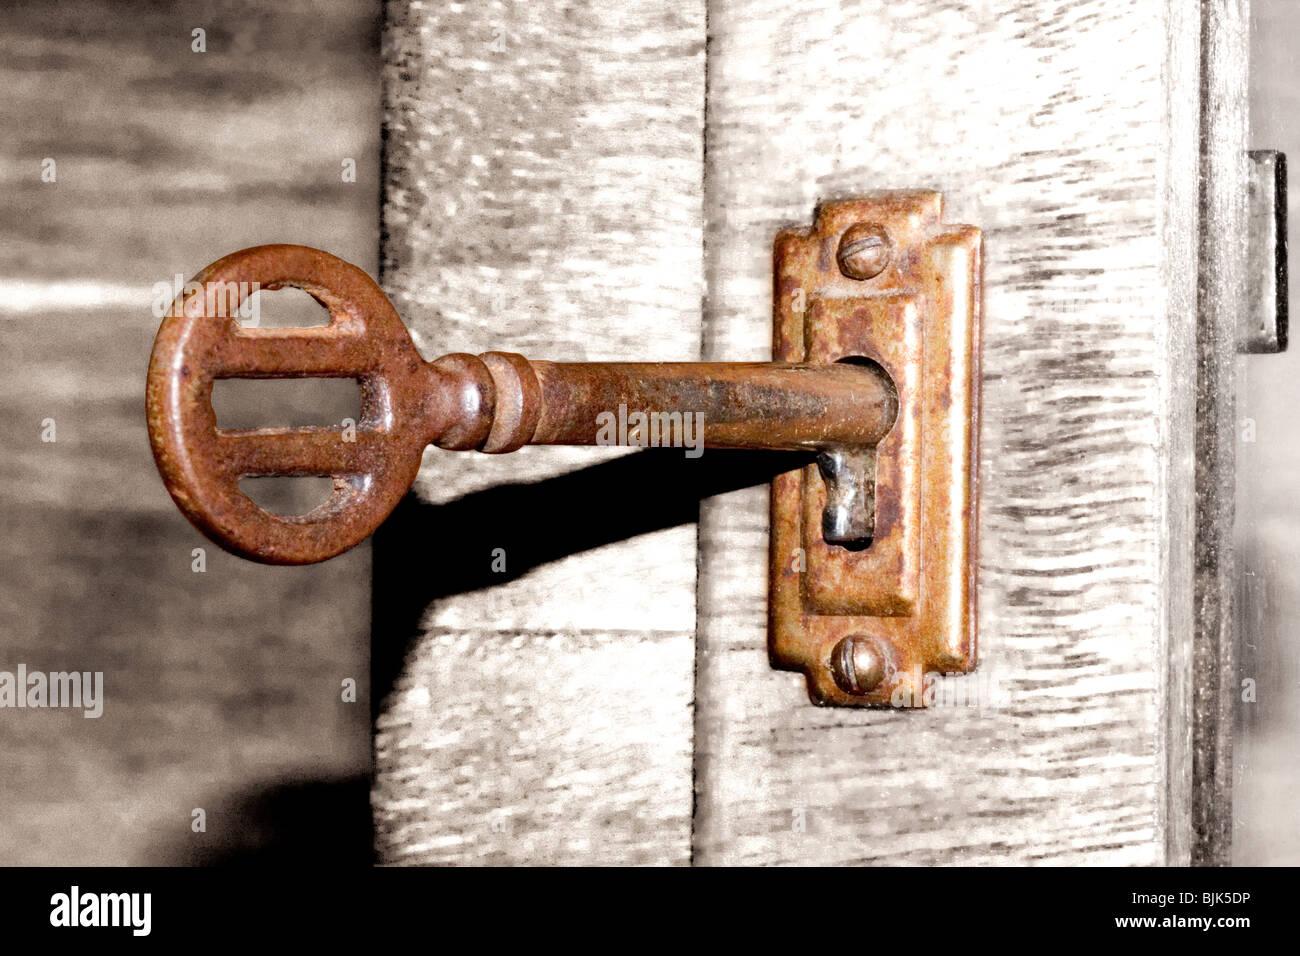 cabinet stock photos cabinet stock images alamy. Black Bedroom Furniture Sets. Home Design Ideas